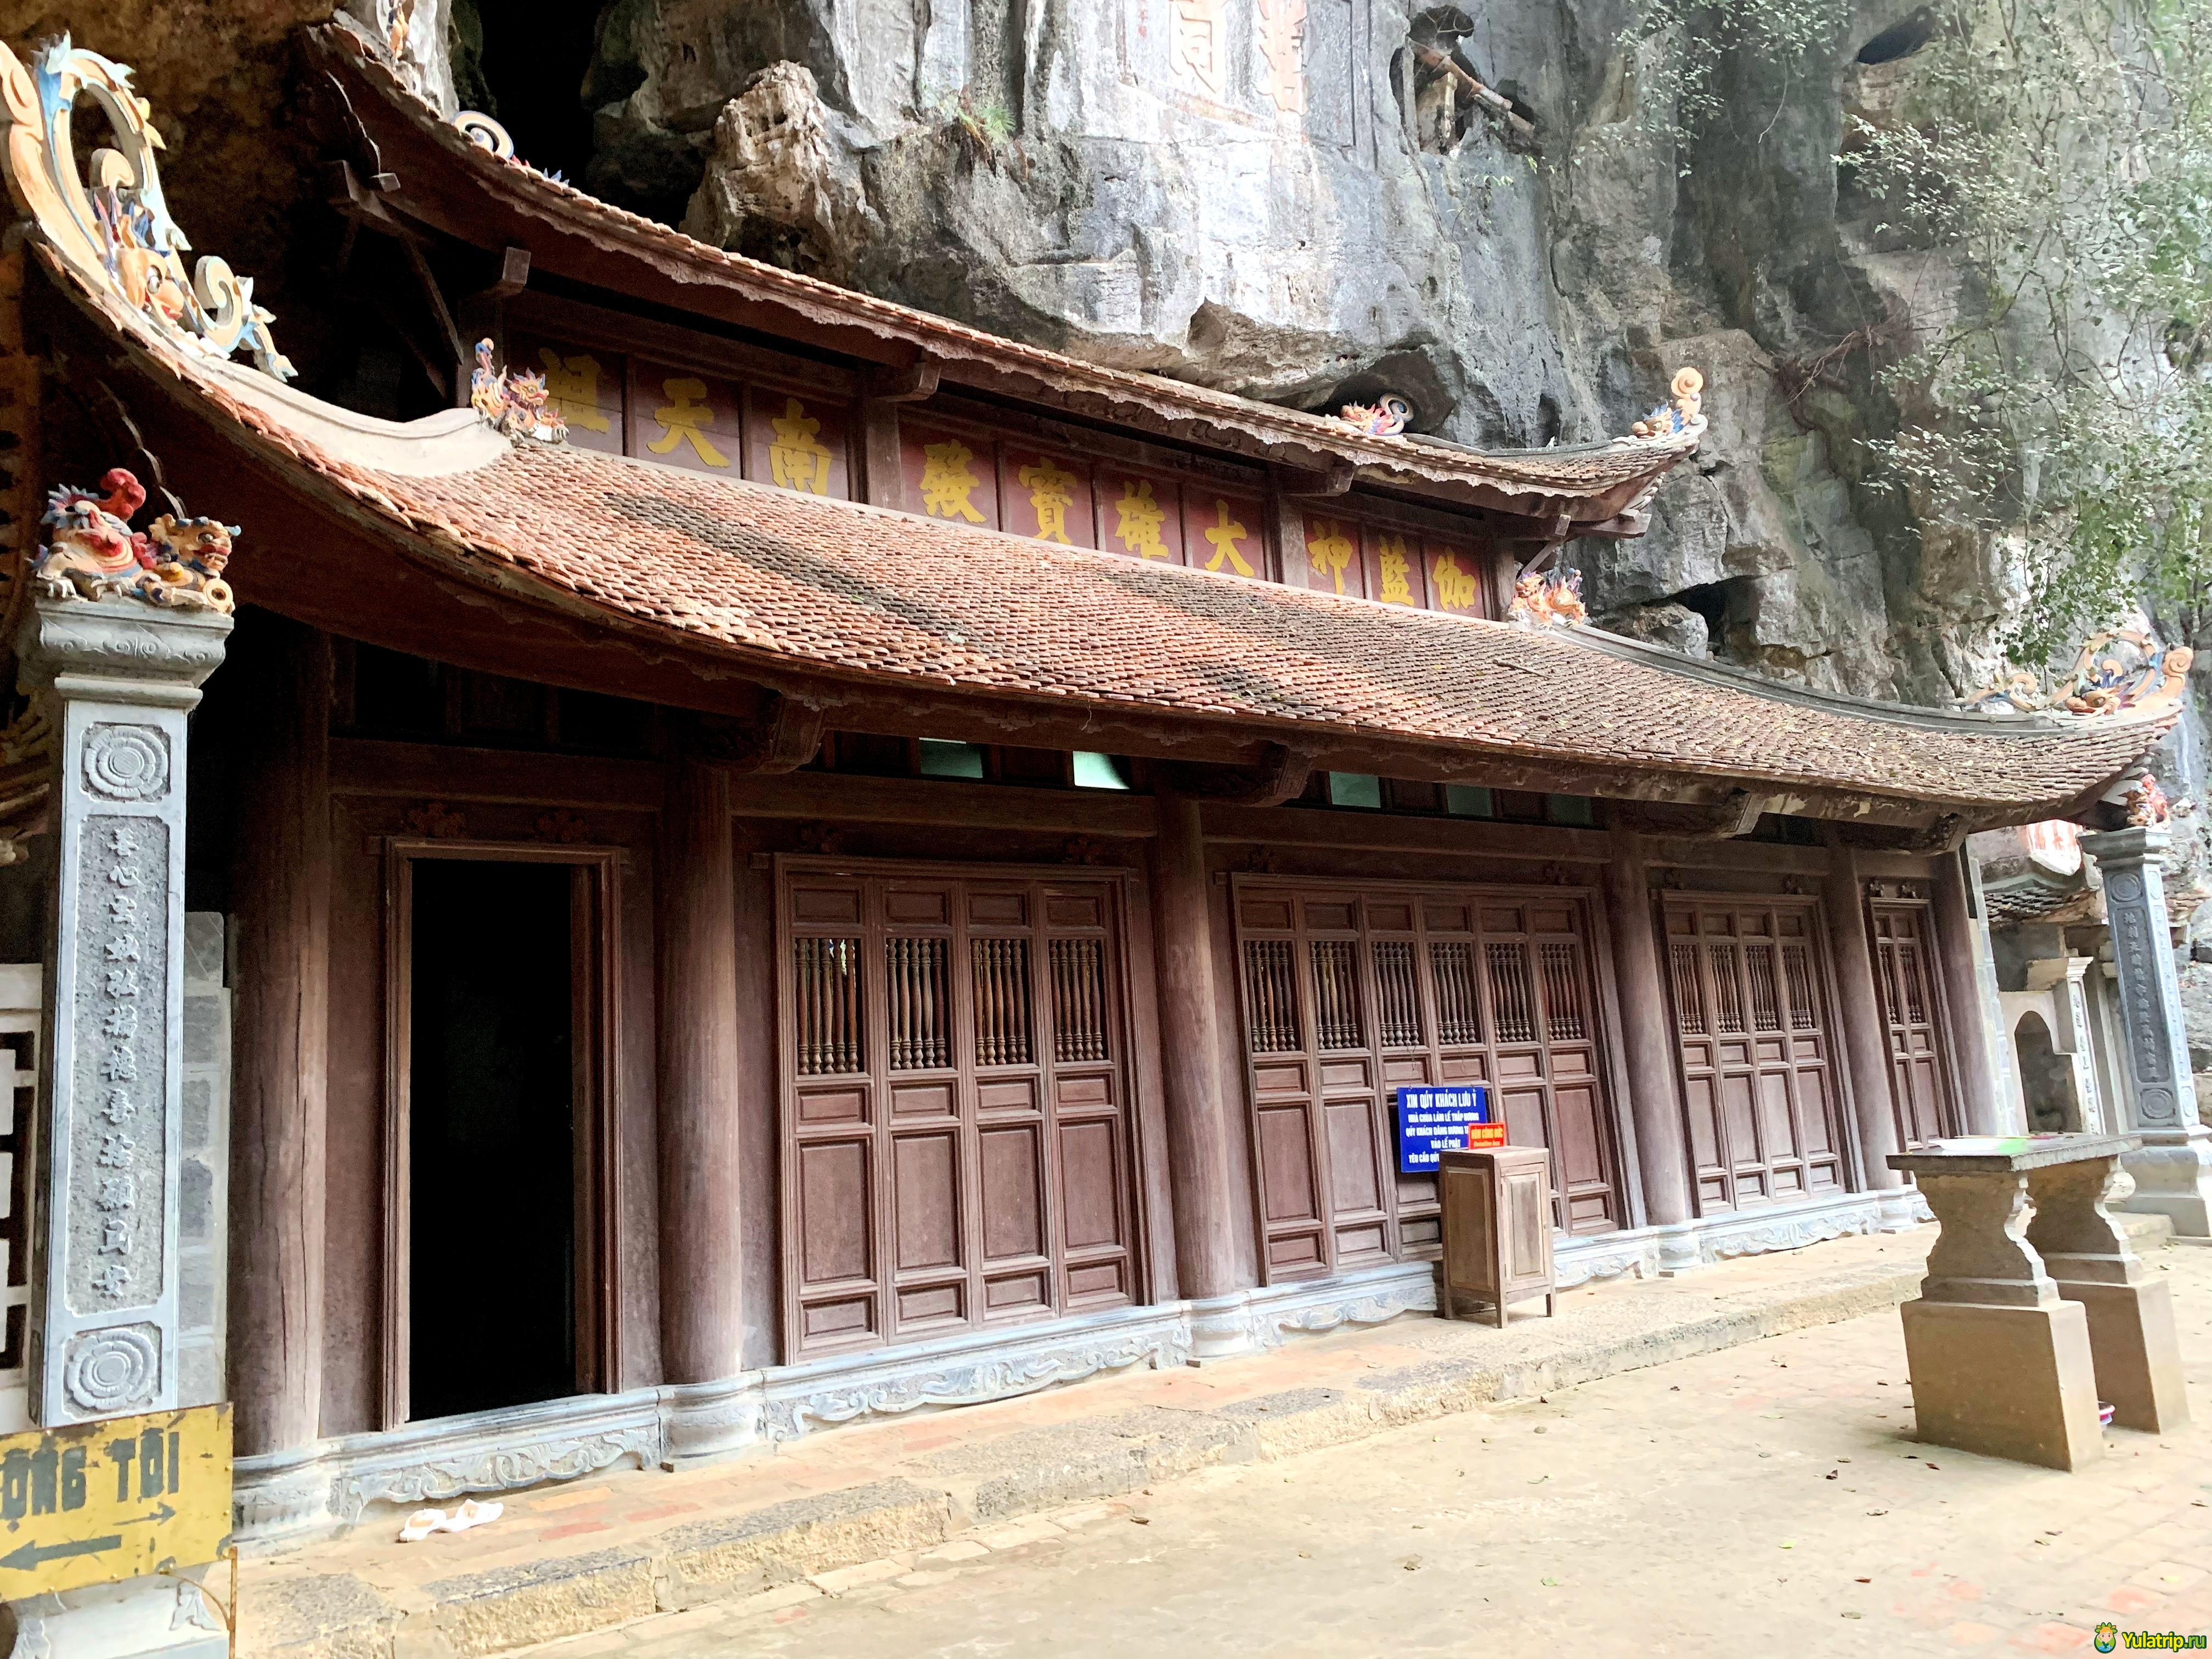 пагода бич донг зеленая жемчужина нинь бинь вьетнам